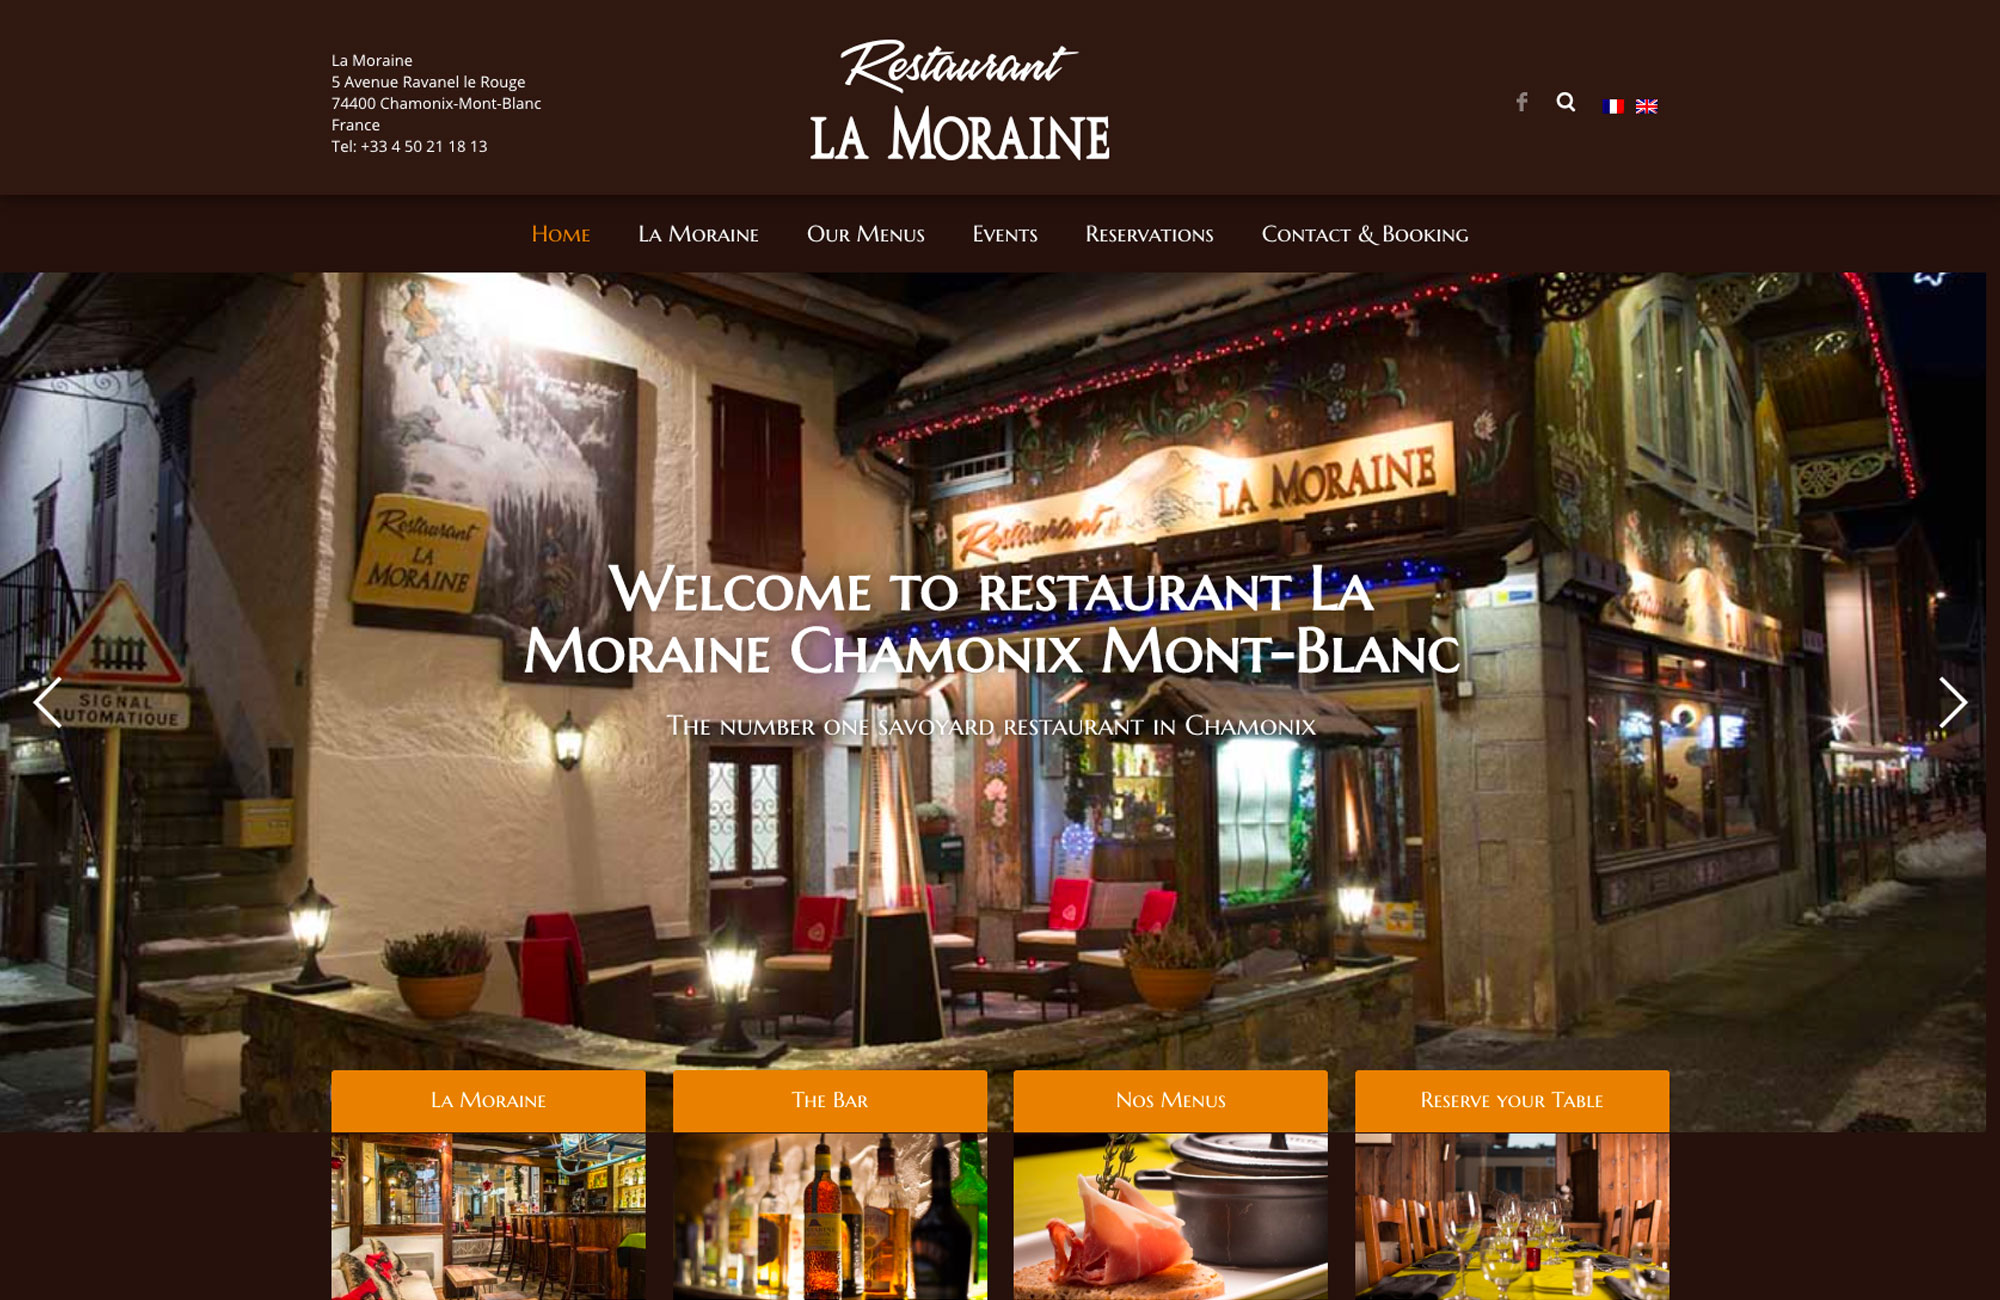 La Moraine